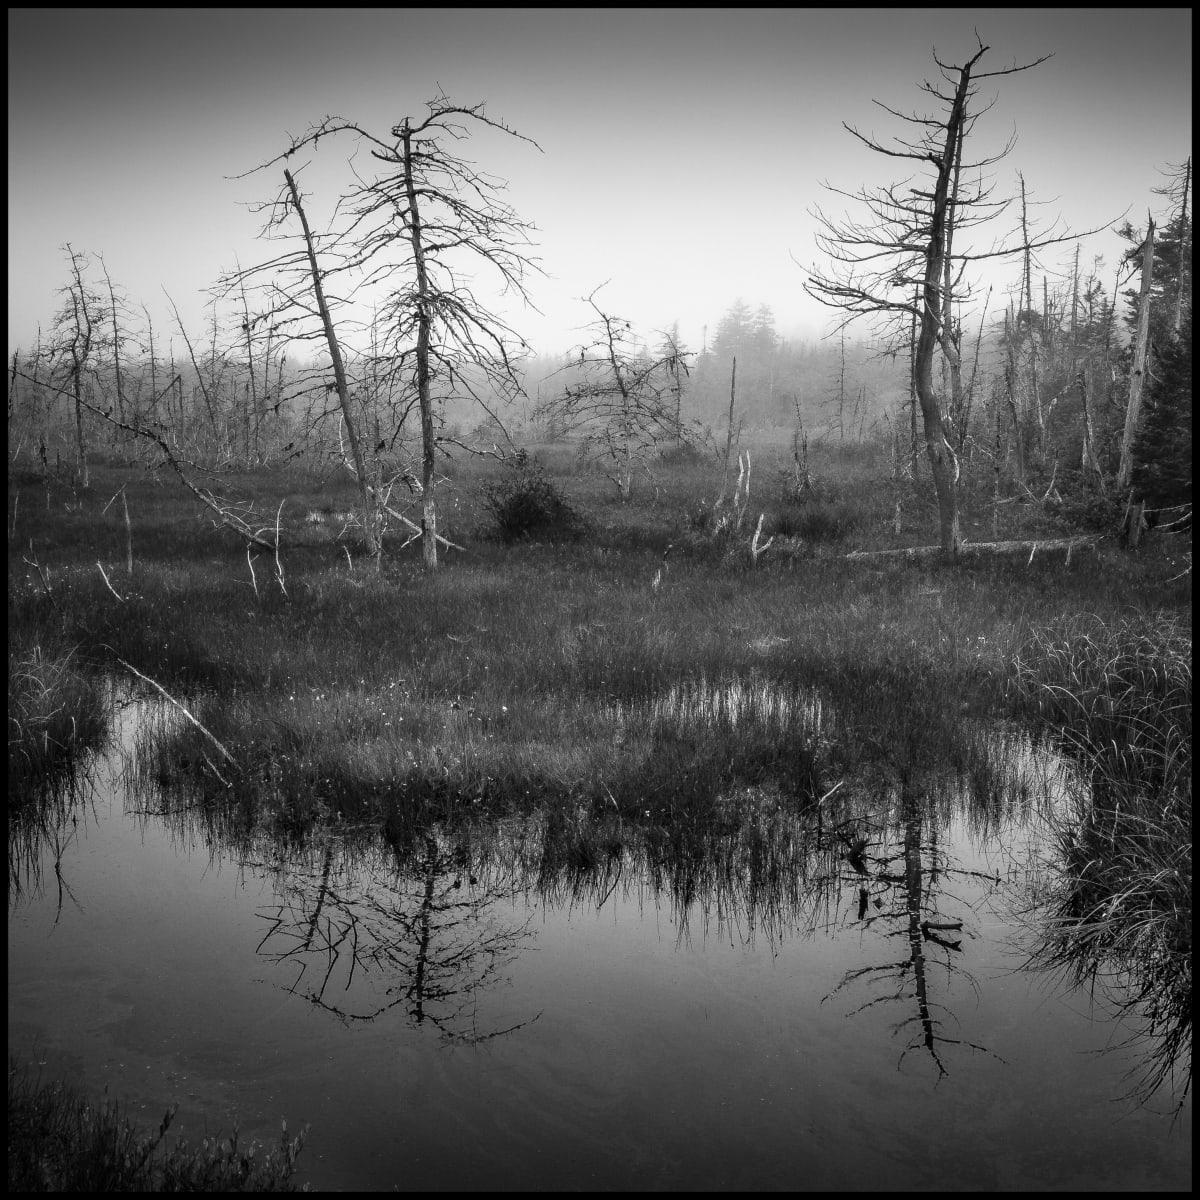 Bog, Nova Scotia by Mark Brennan